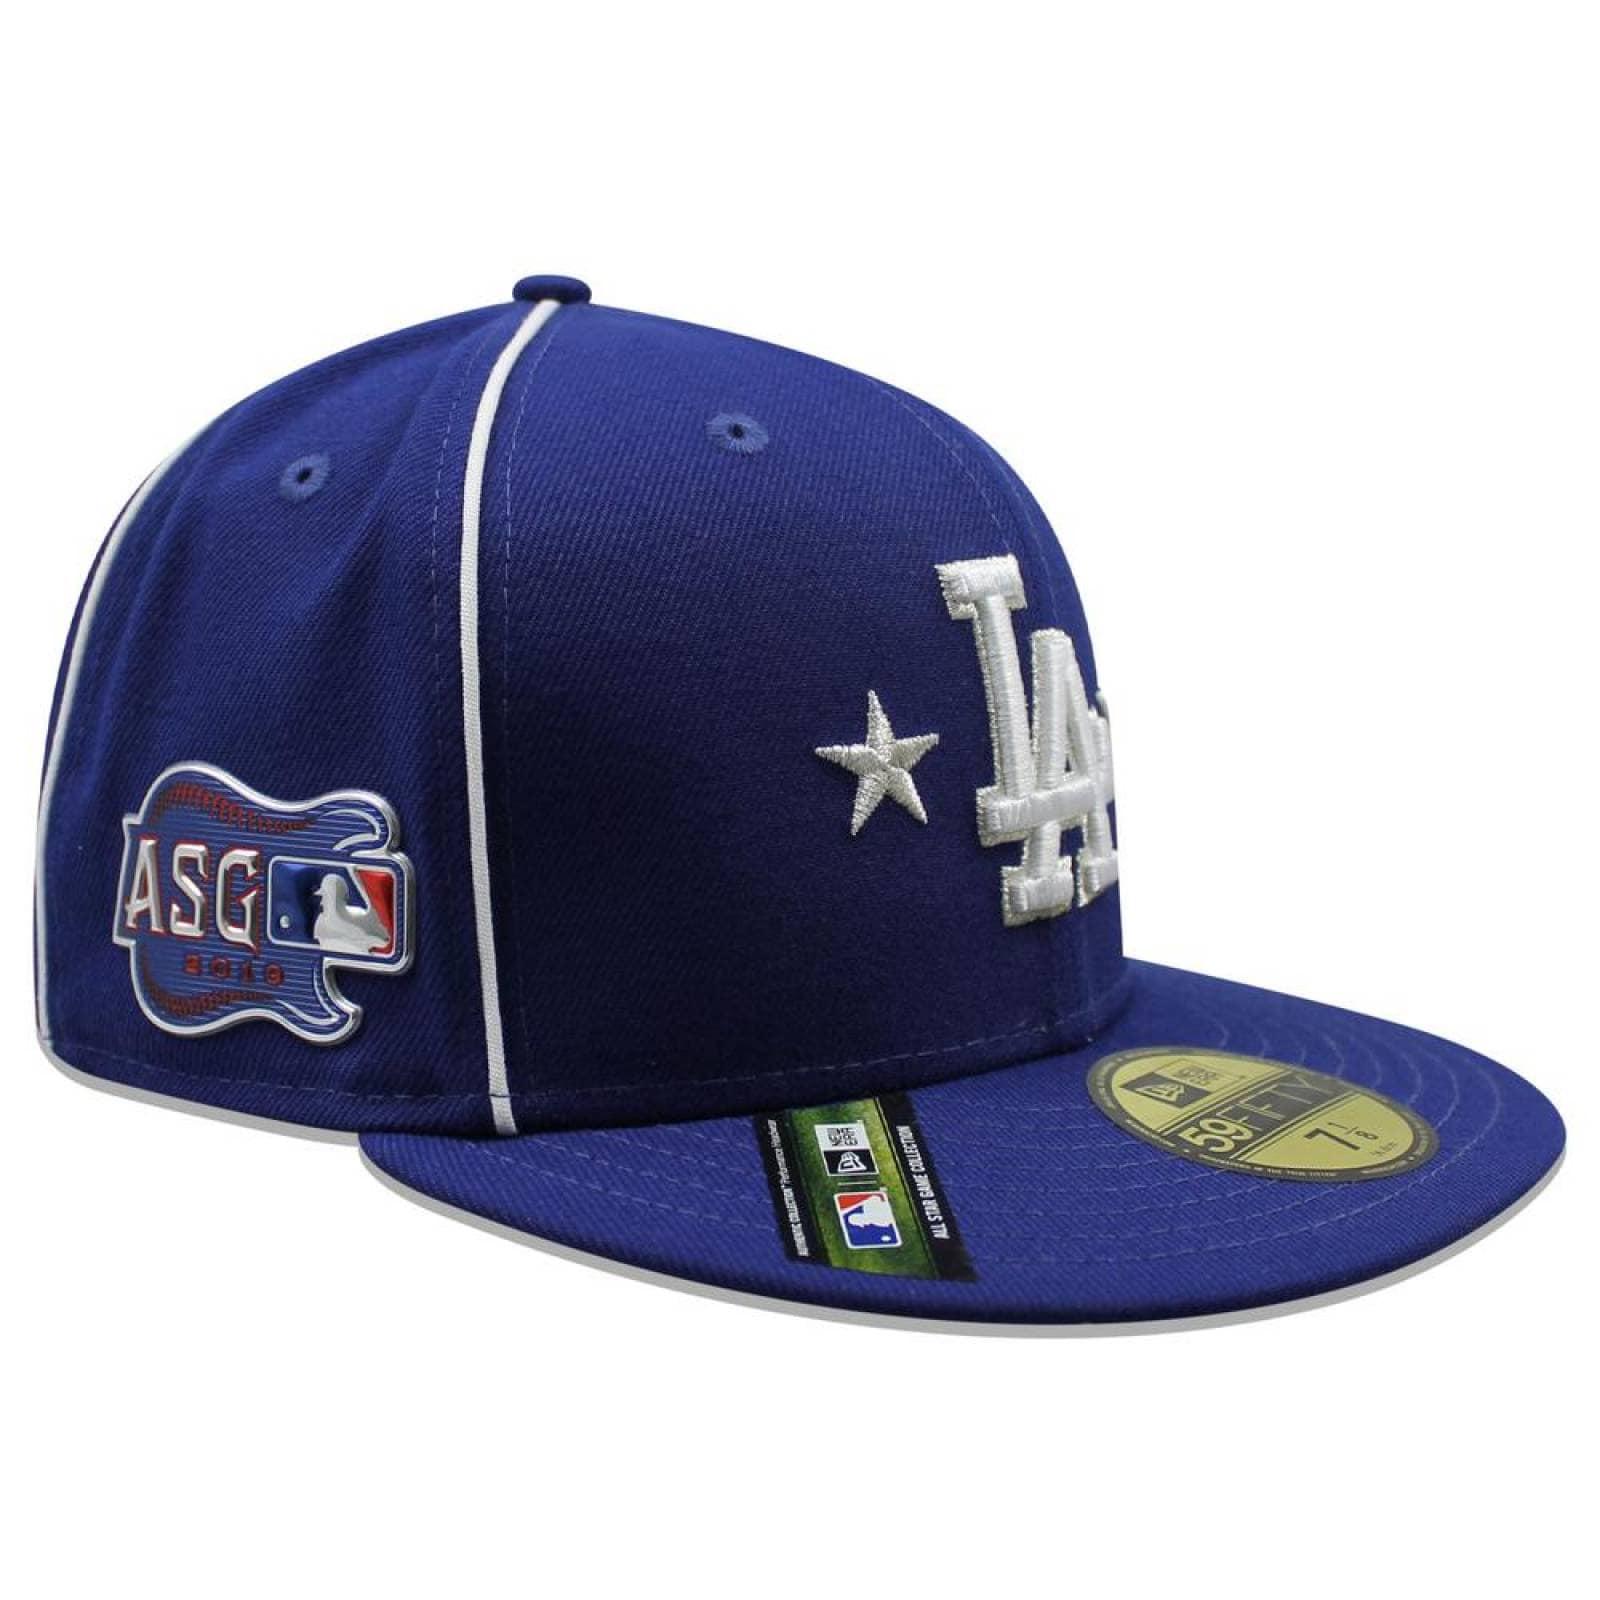 Gorra New Era 59 Fifty MLB Blue Dodgers Star Game 2019 Azul